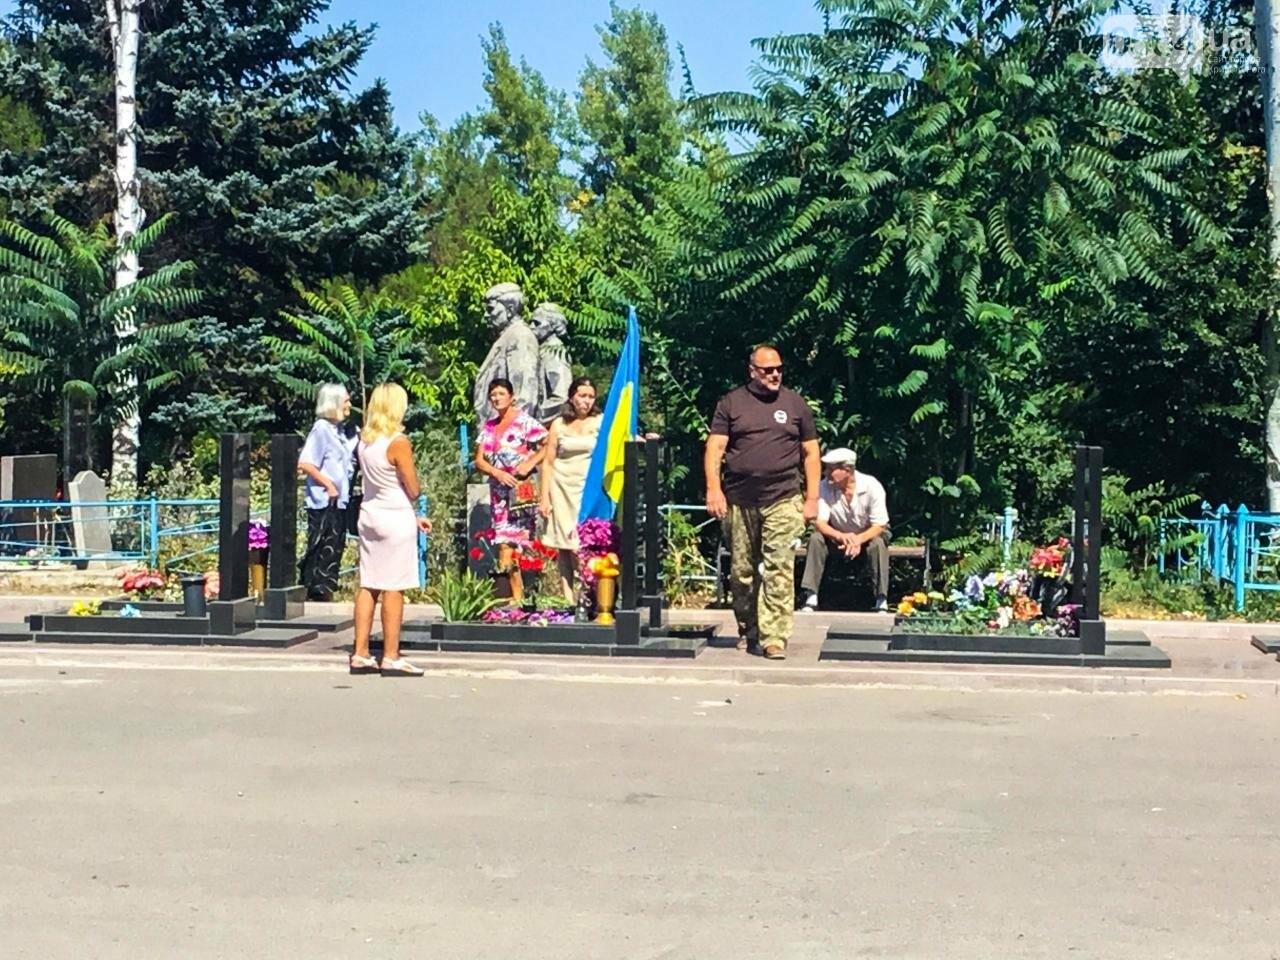 На Аллее Героев провели панихиду по погибшим в зоне АТО криворожанам, - ФОТО , фото-4